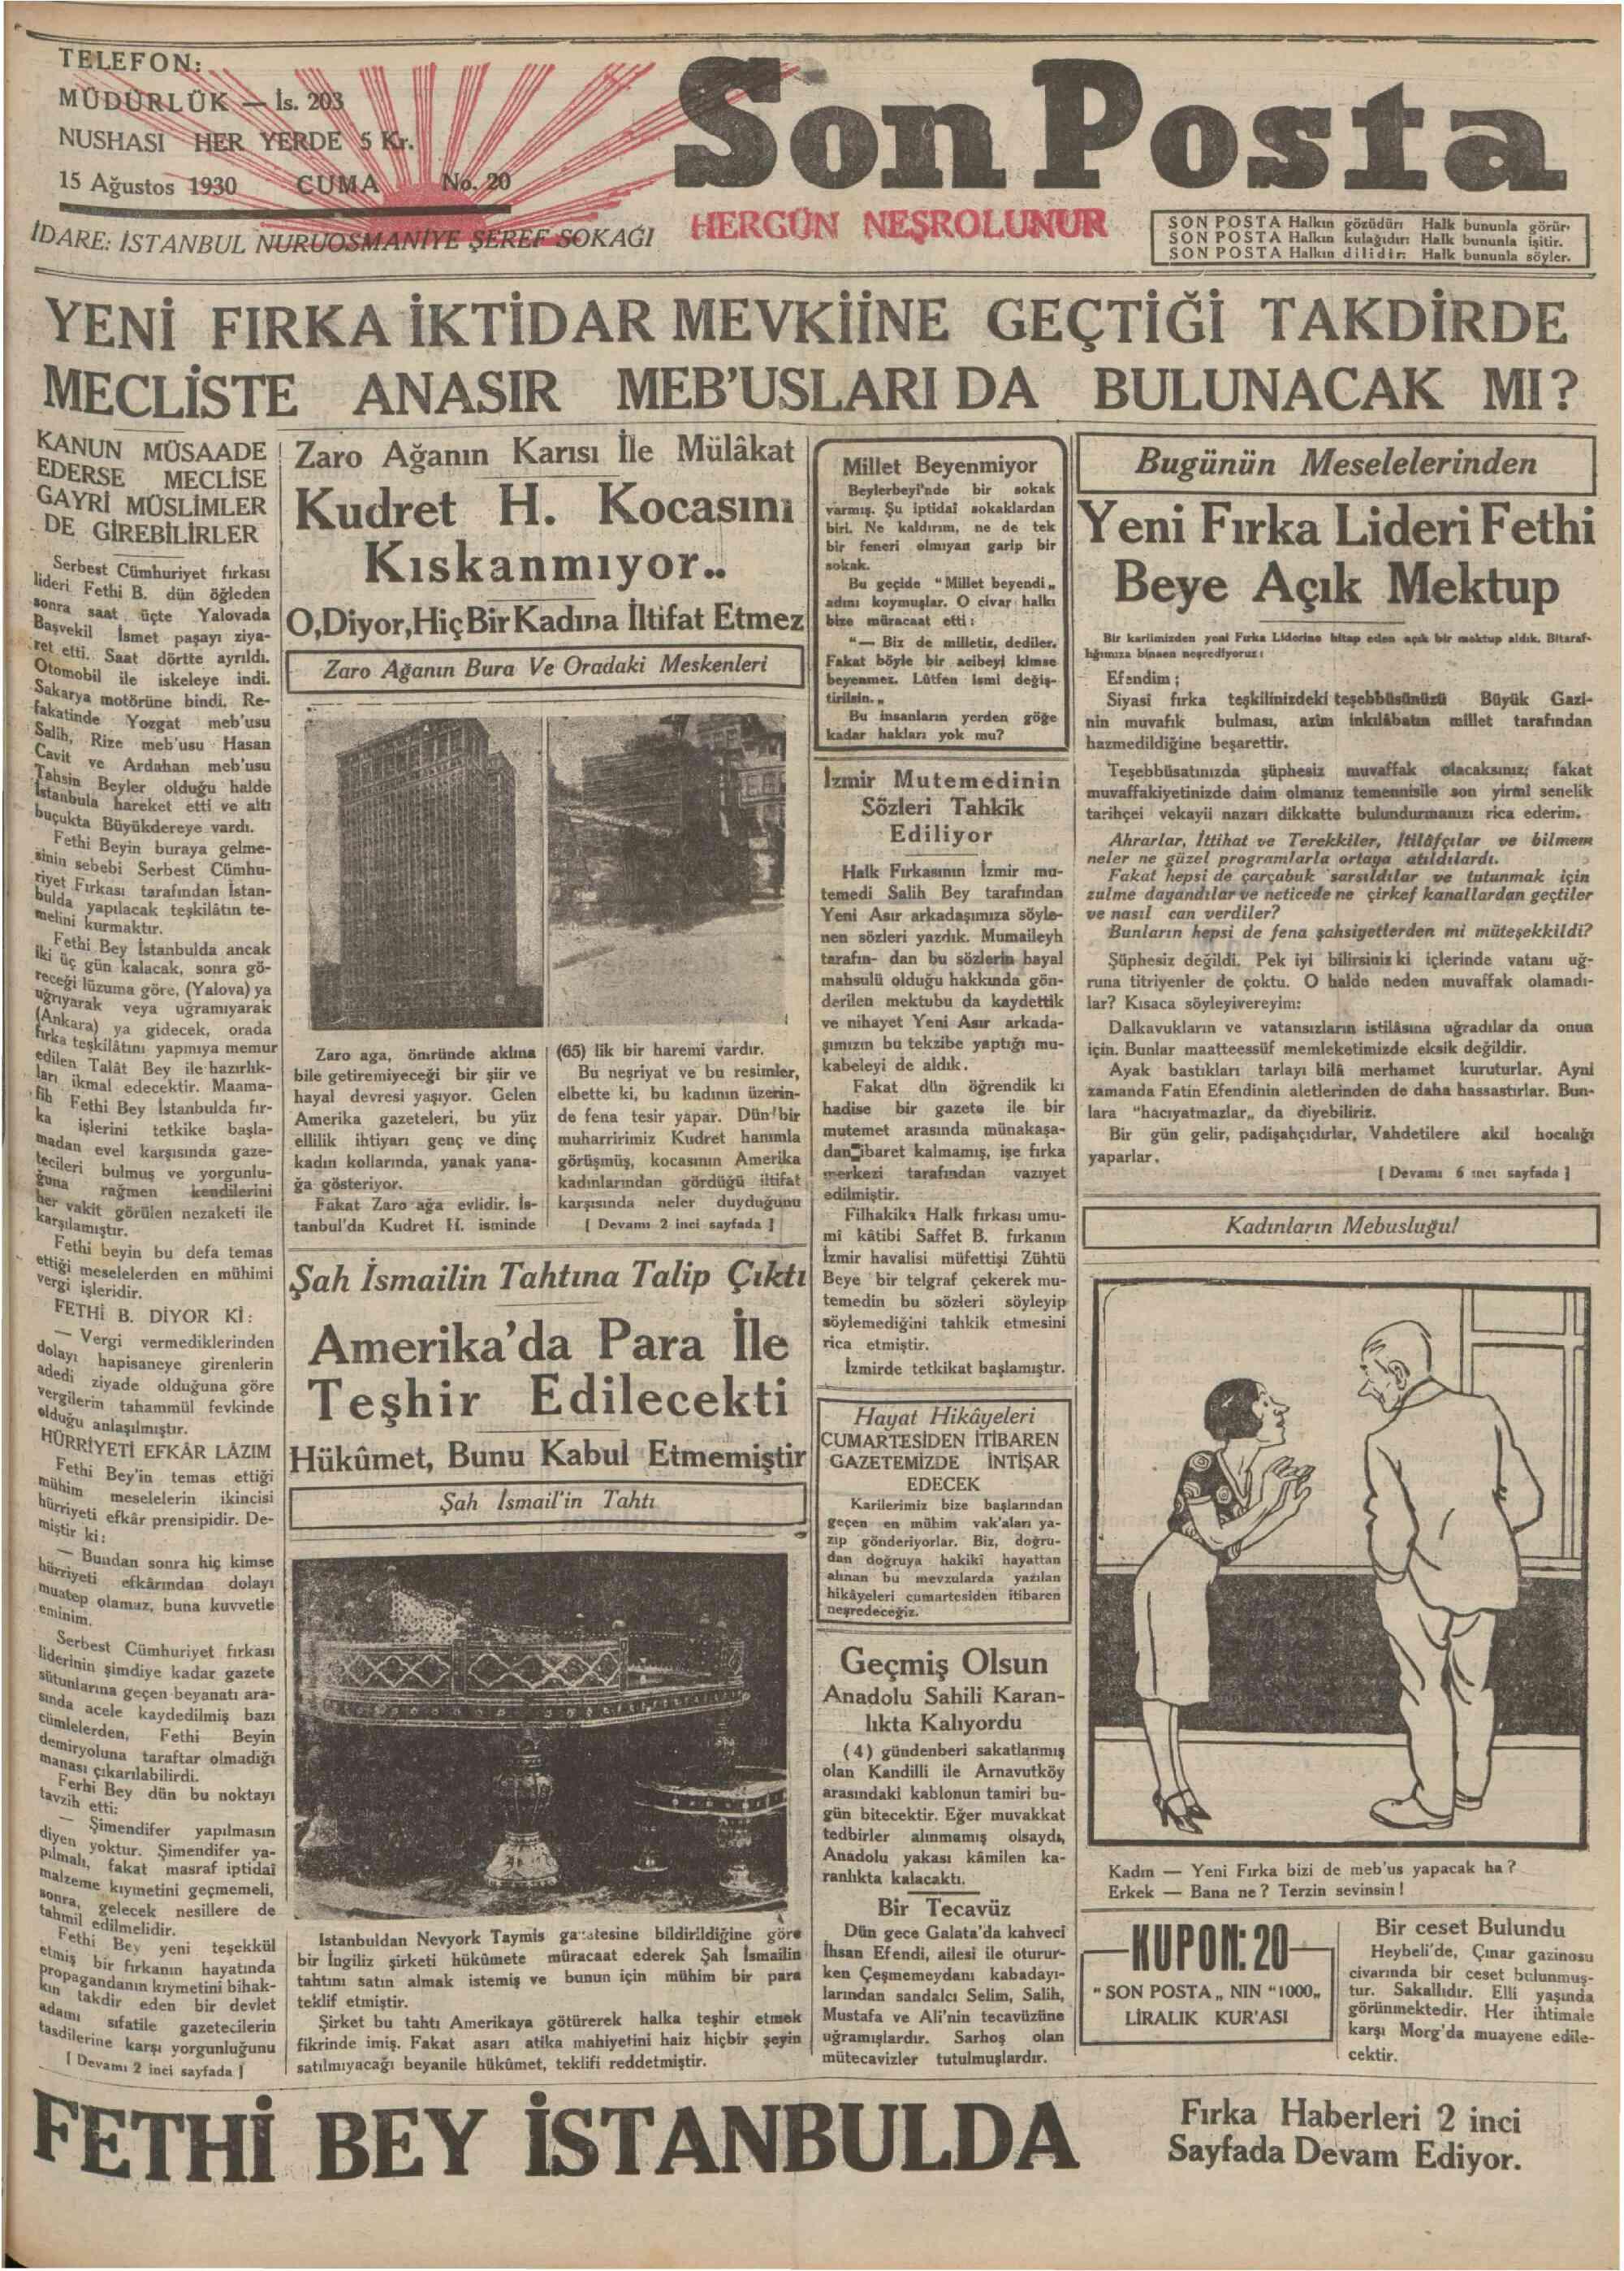 15 Ağustos 1930 Tarihli Son Posta Gazetesi Sayfa 1